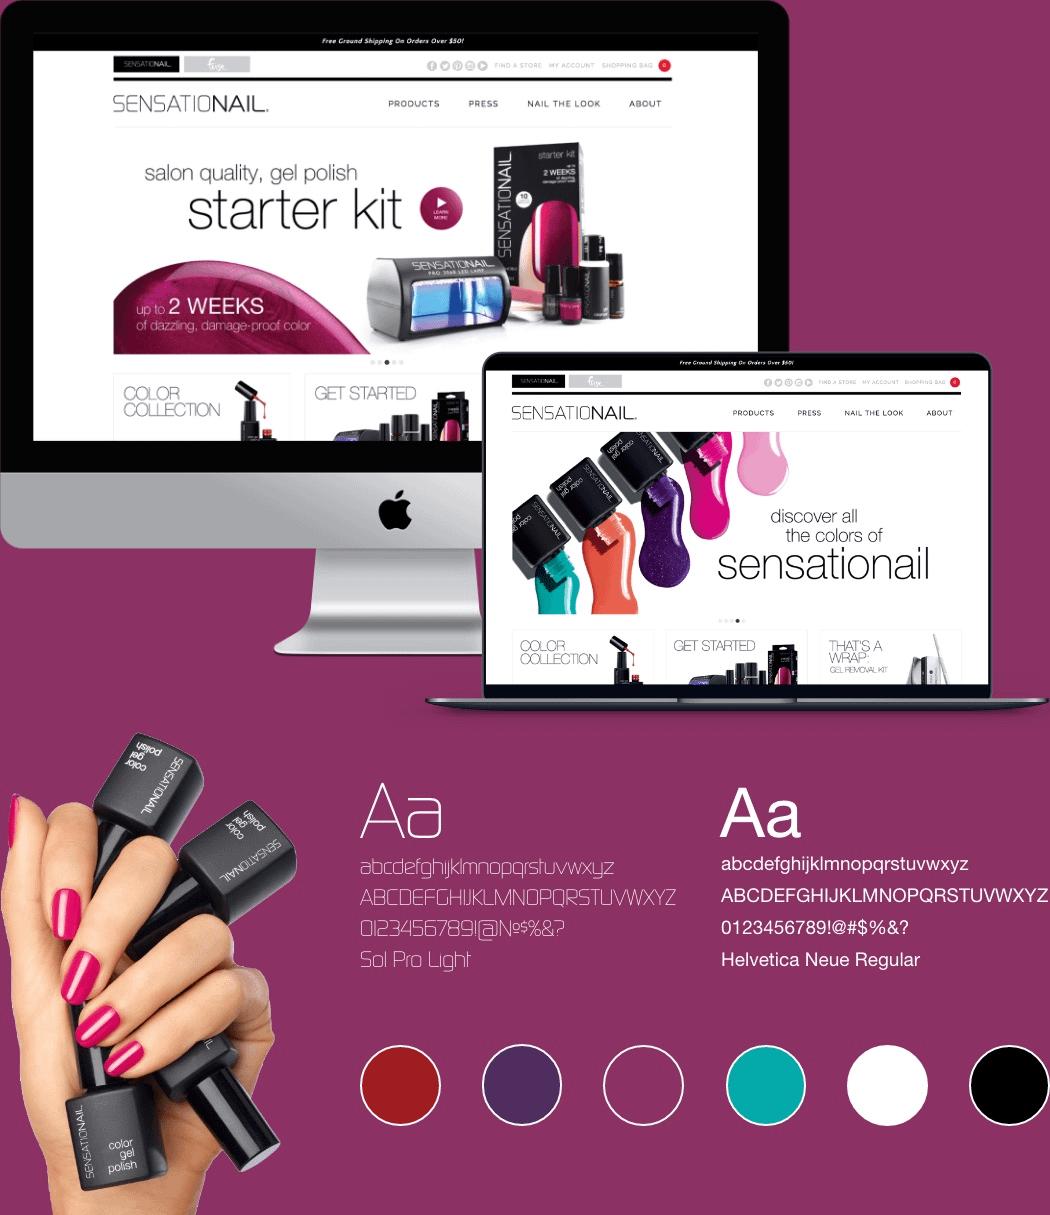 sensationail-website